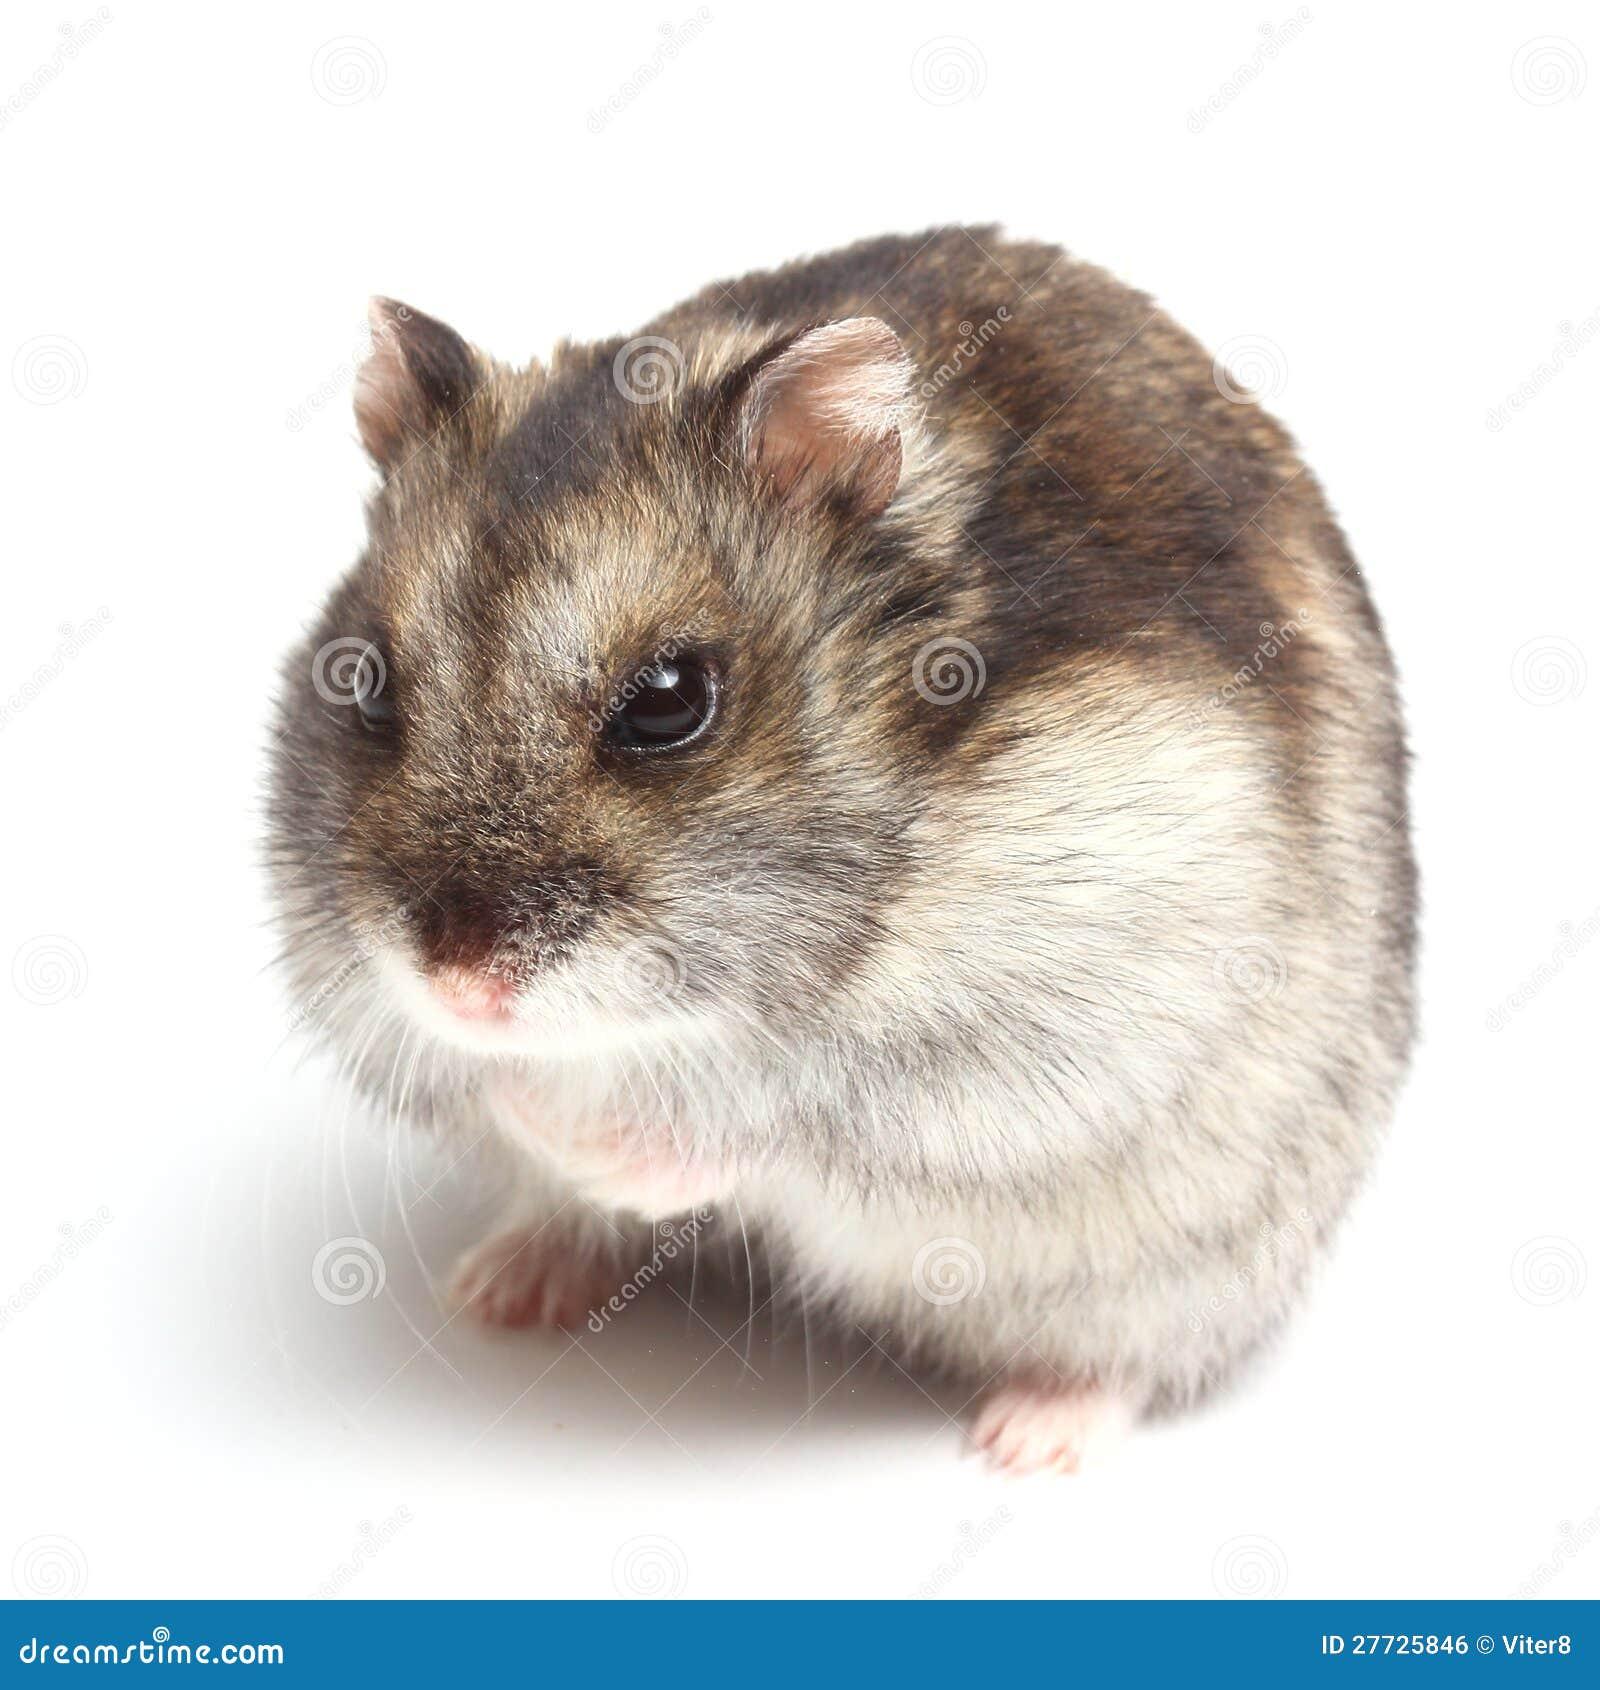 Djungarian Hamster (Phodopus sungorus)